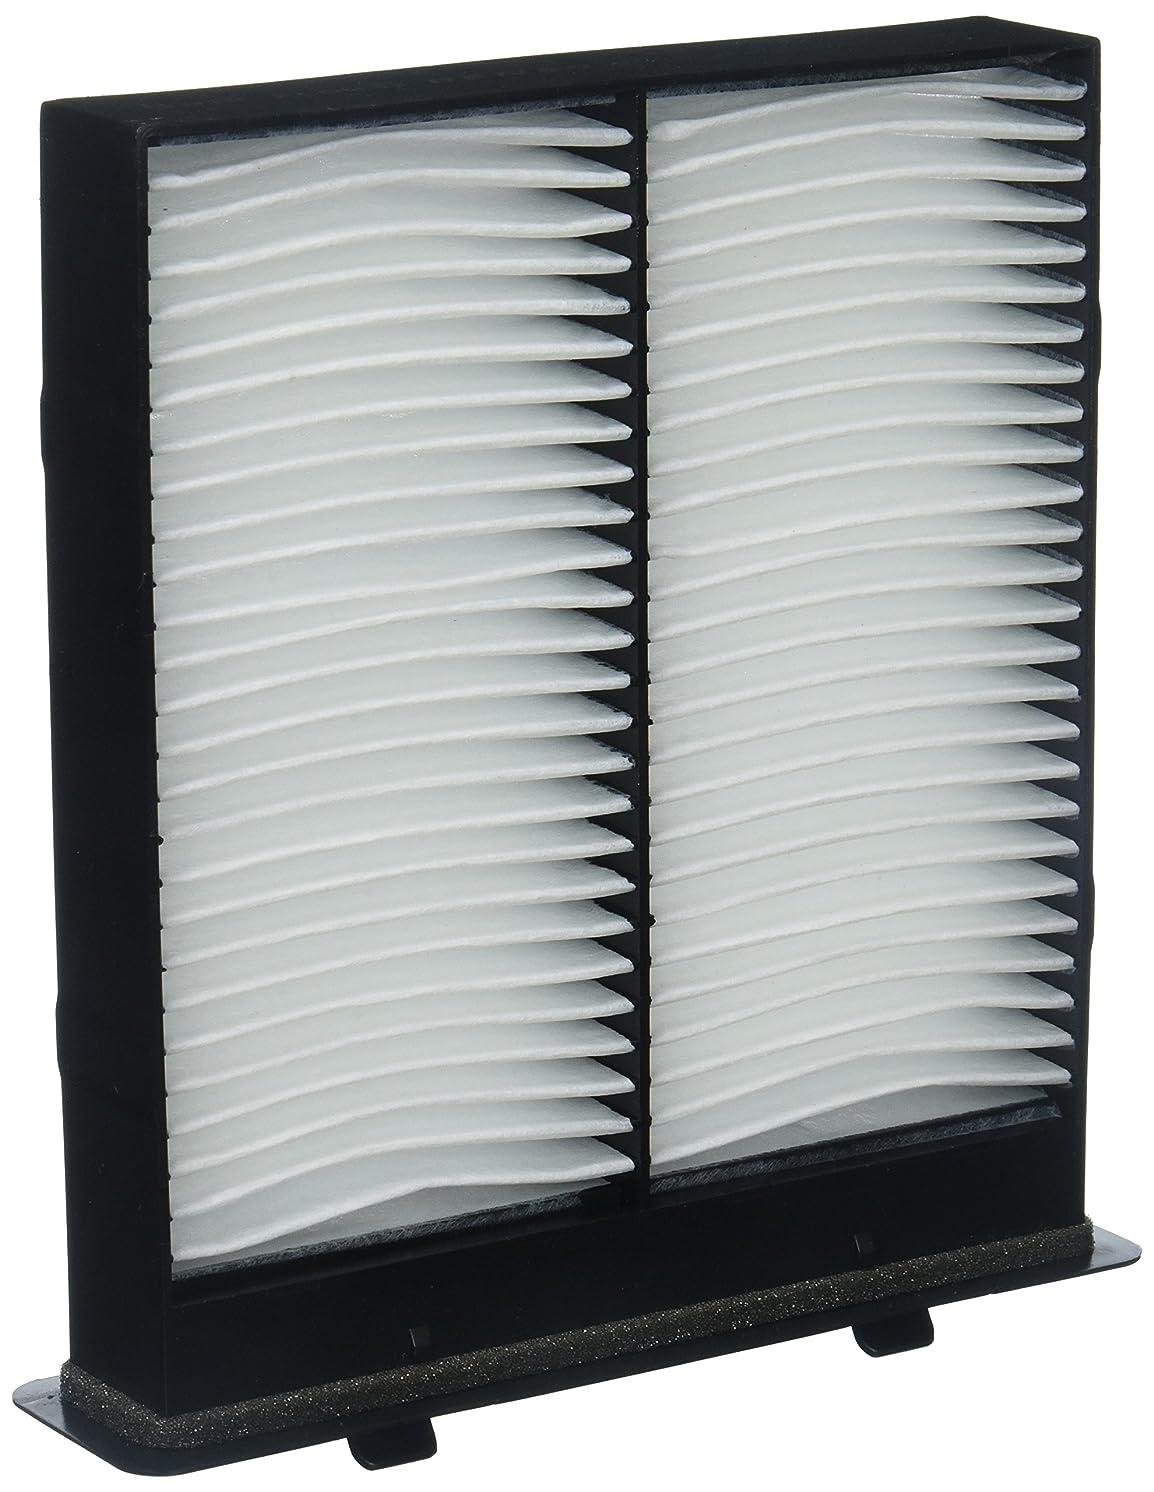 Denso 453-4025 Cabin Air Filter